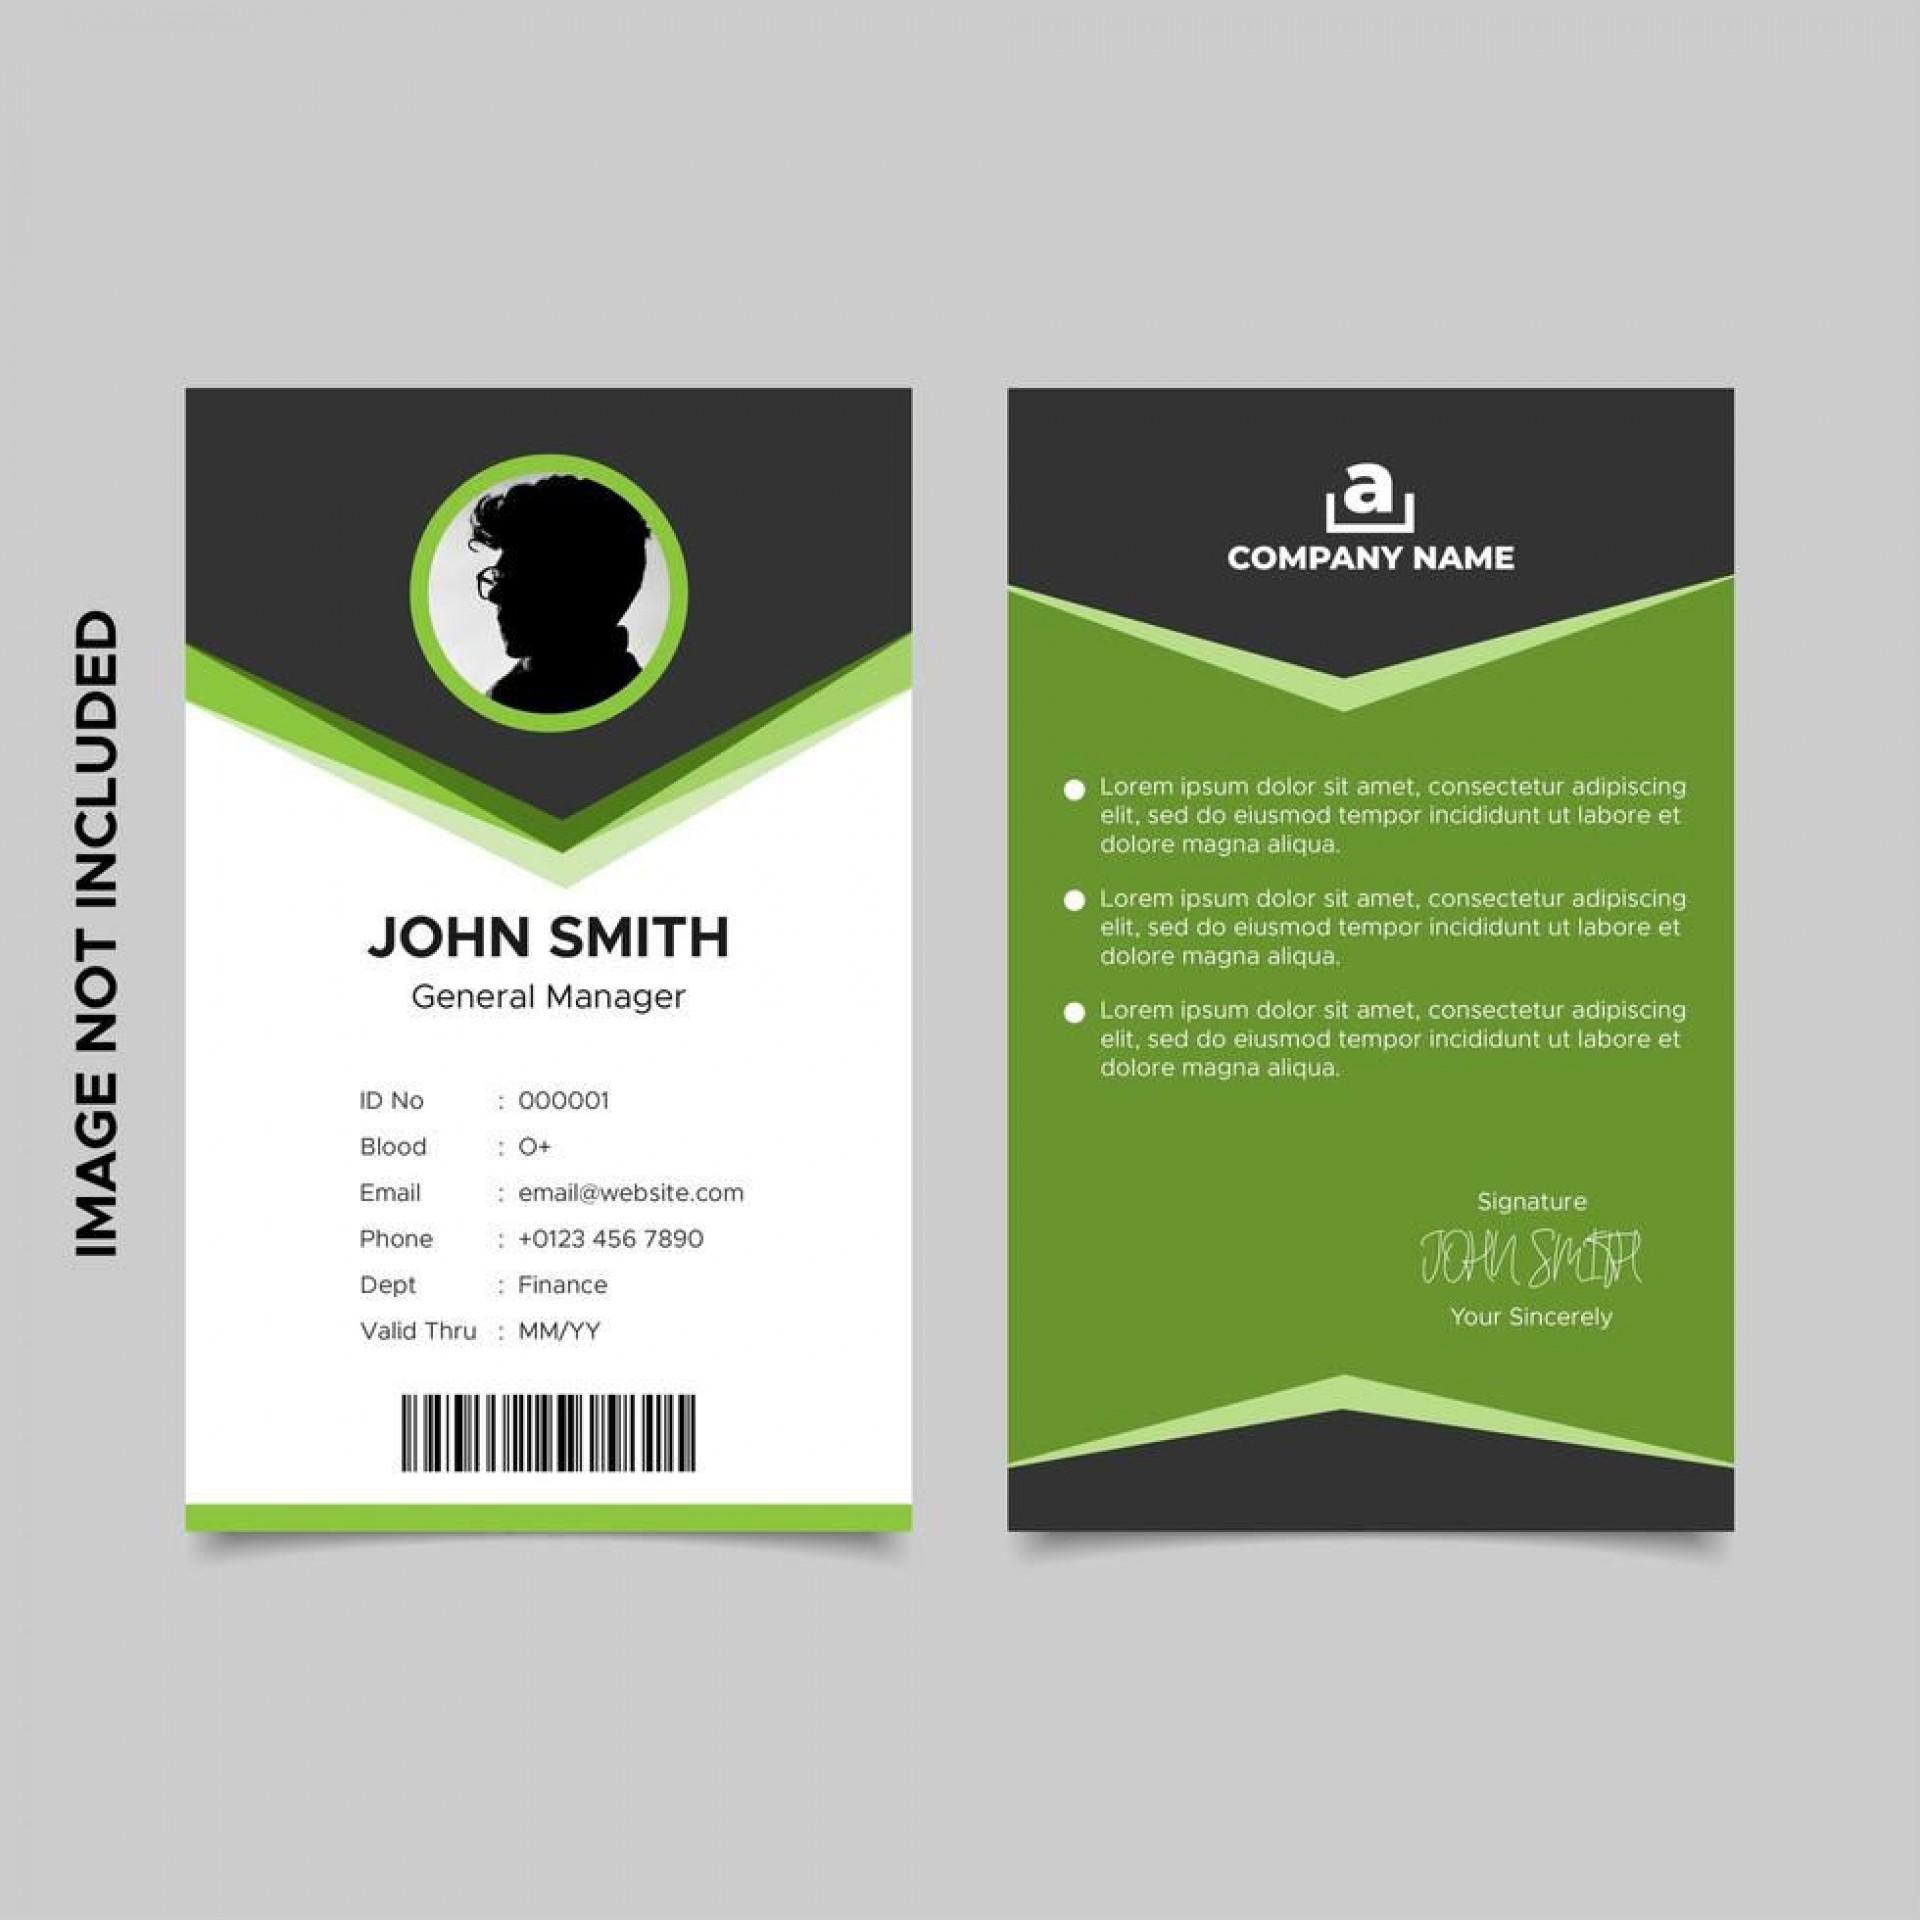 003 Wonderful Id Card Template Free Highest Clarity  Download Pdf Design1920